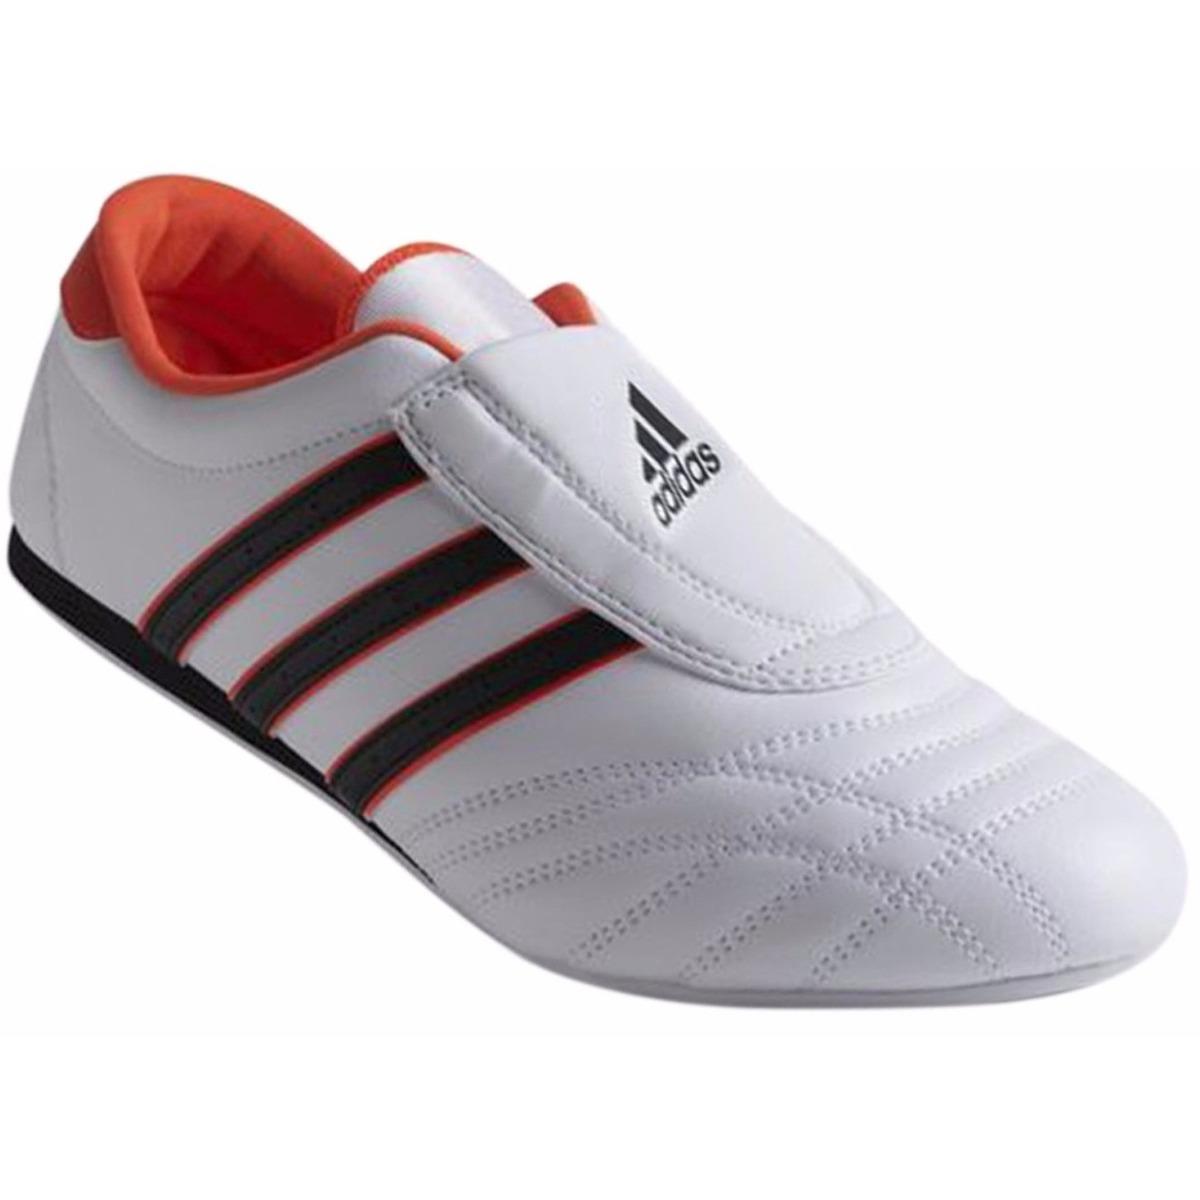 zapatillas adidas taekwondo adilux